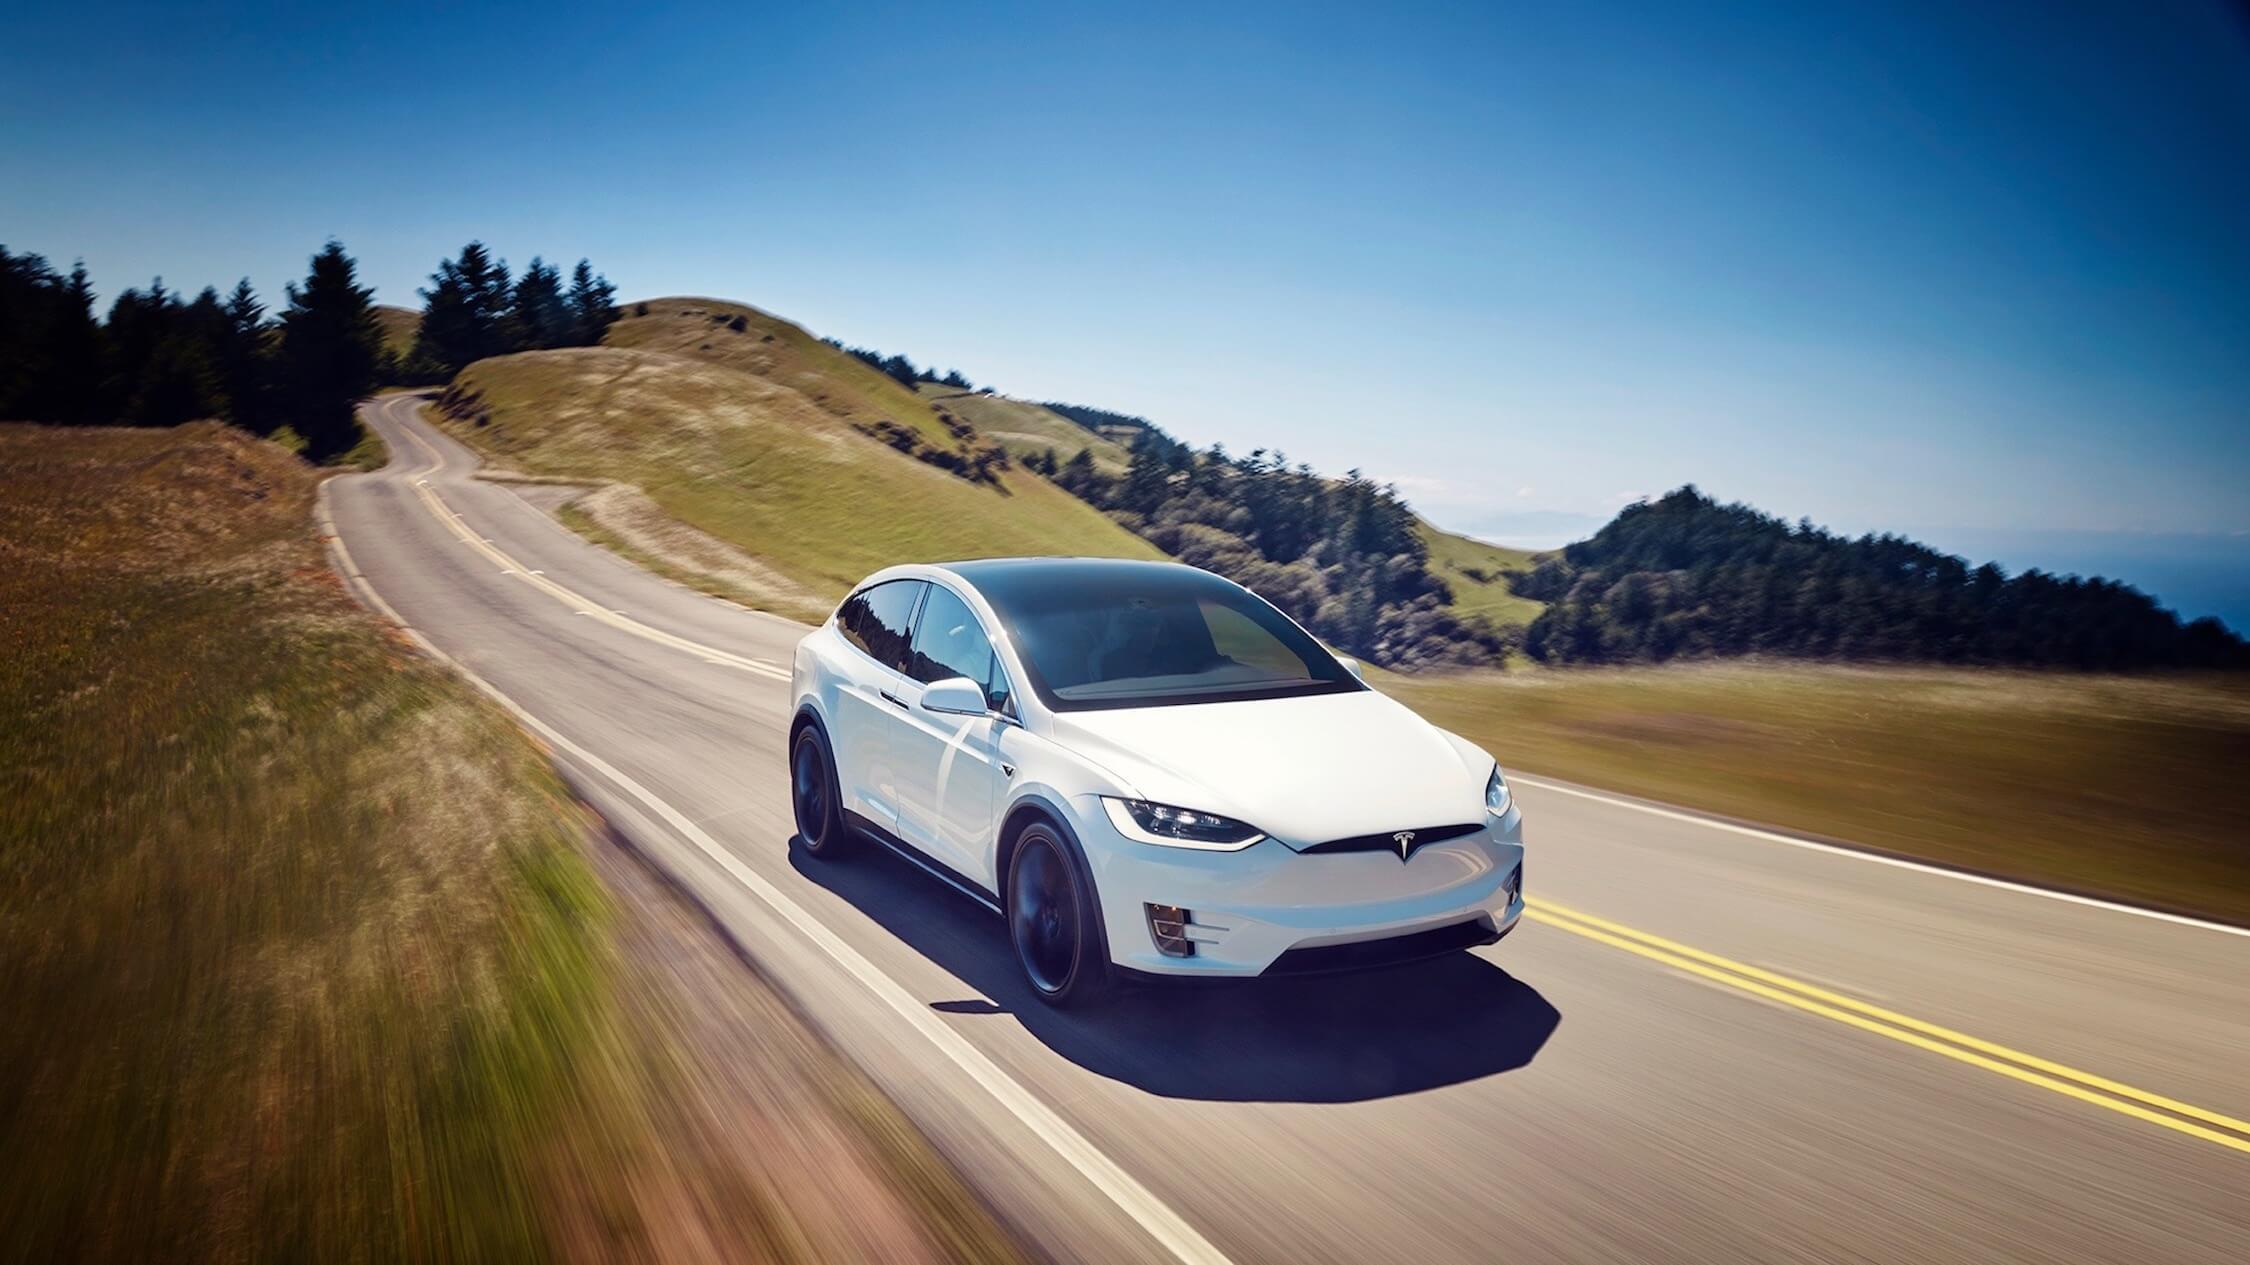 Tesla Model X elektrische SUV